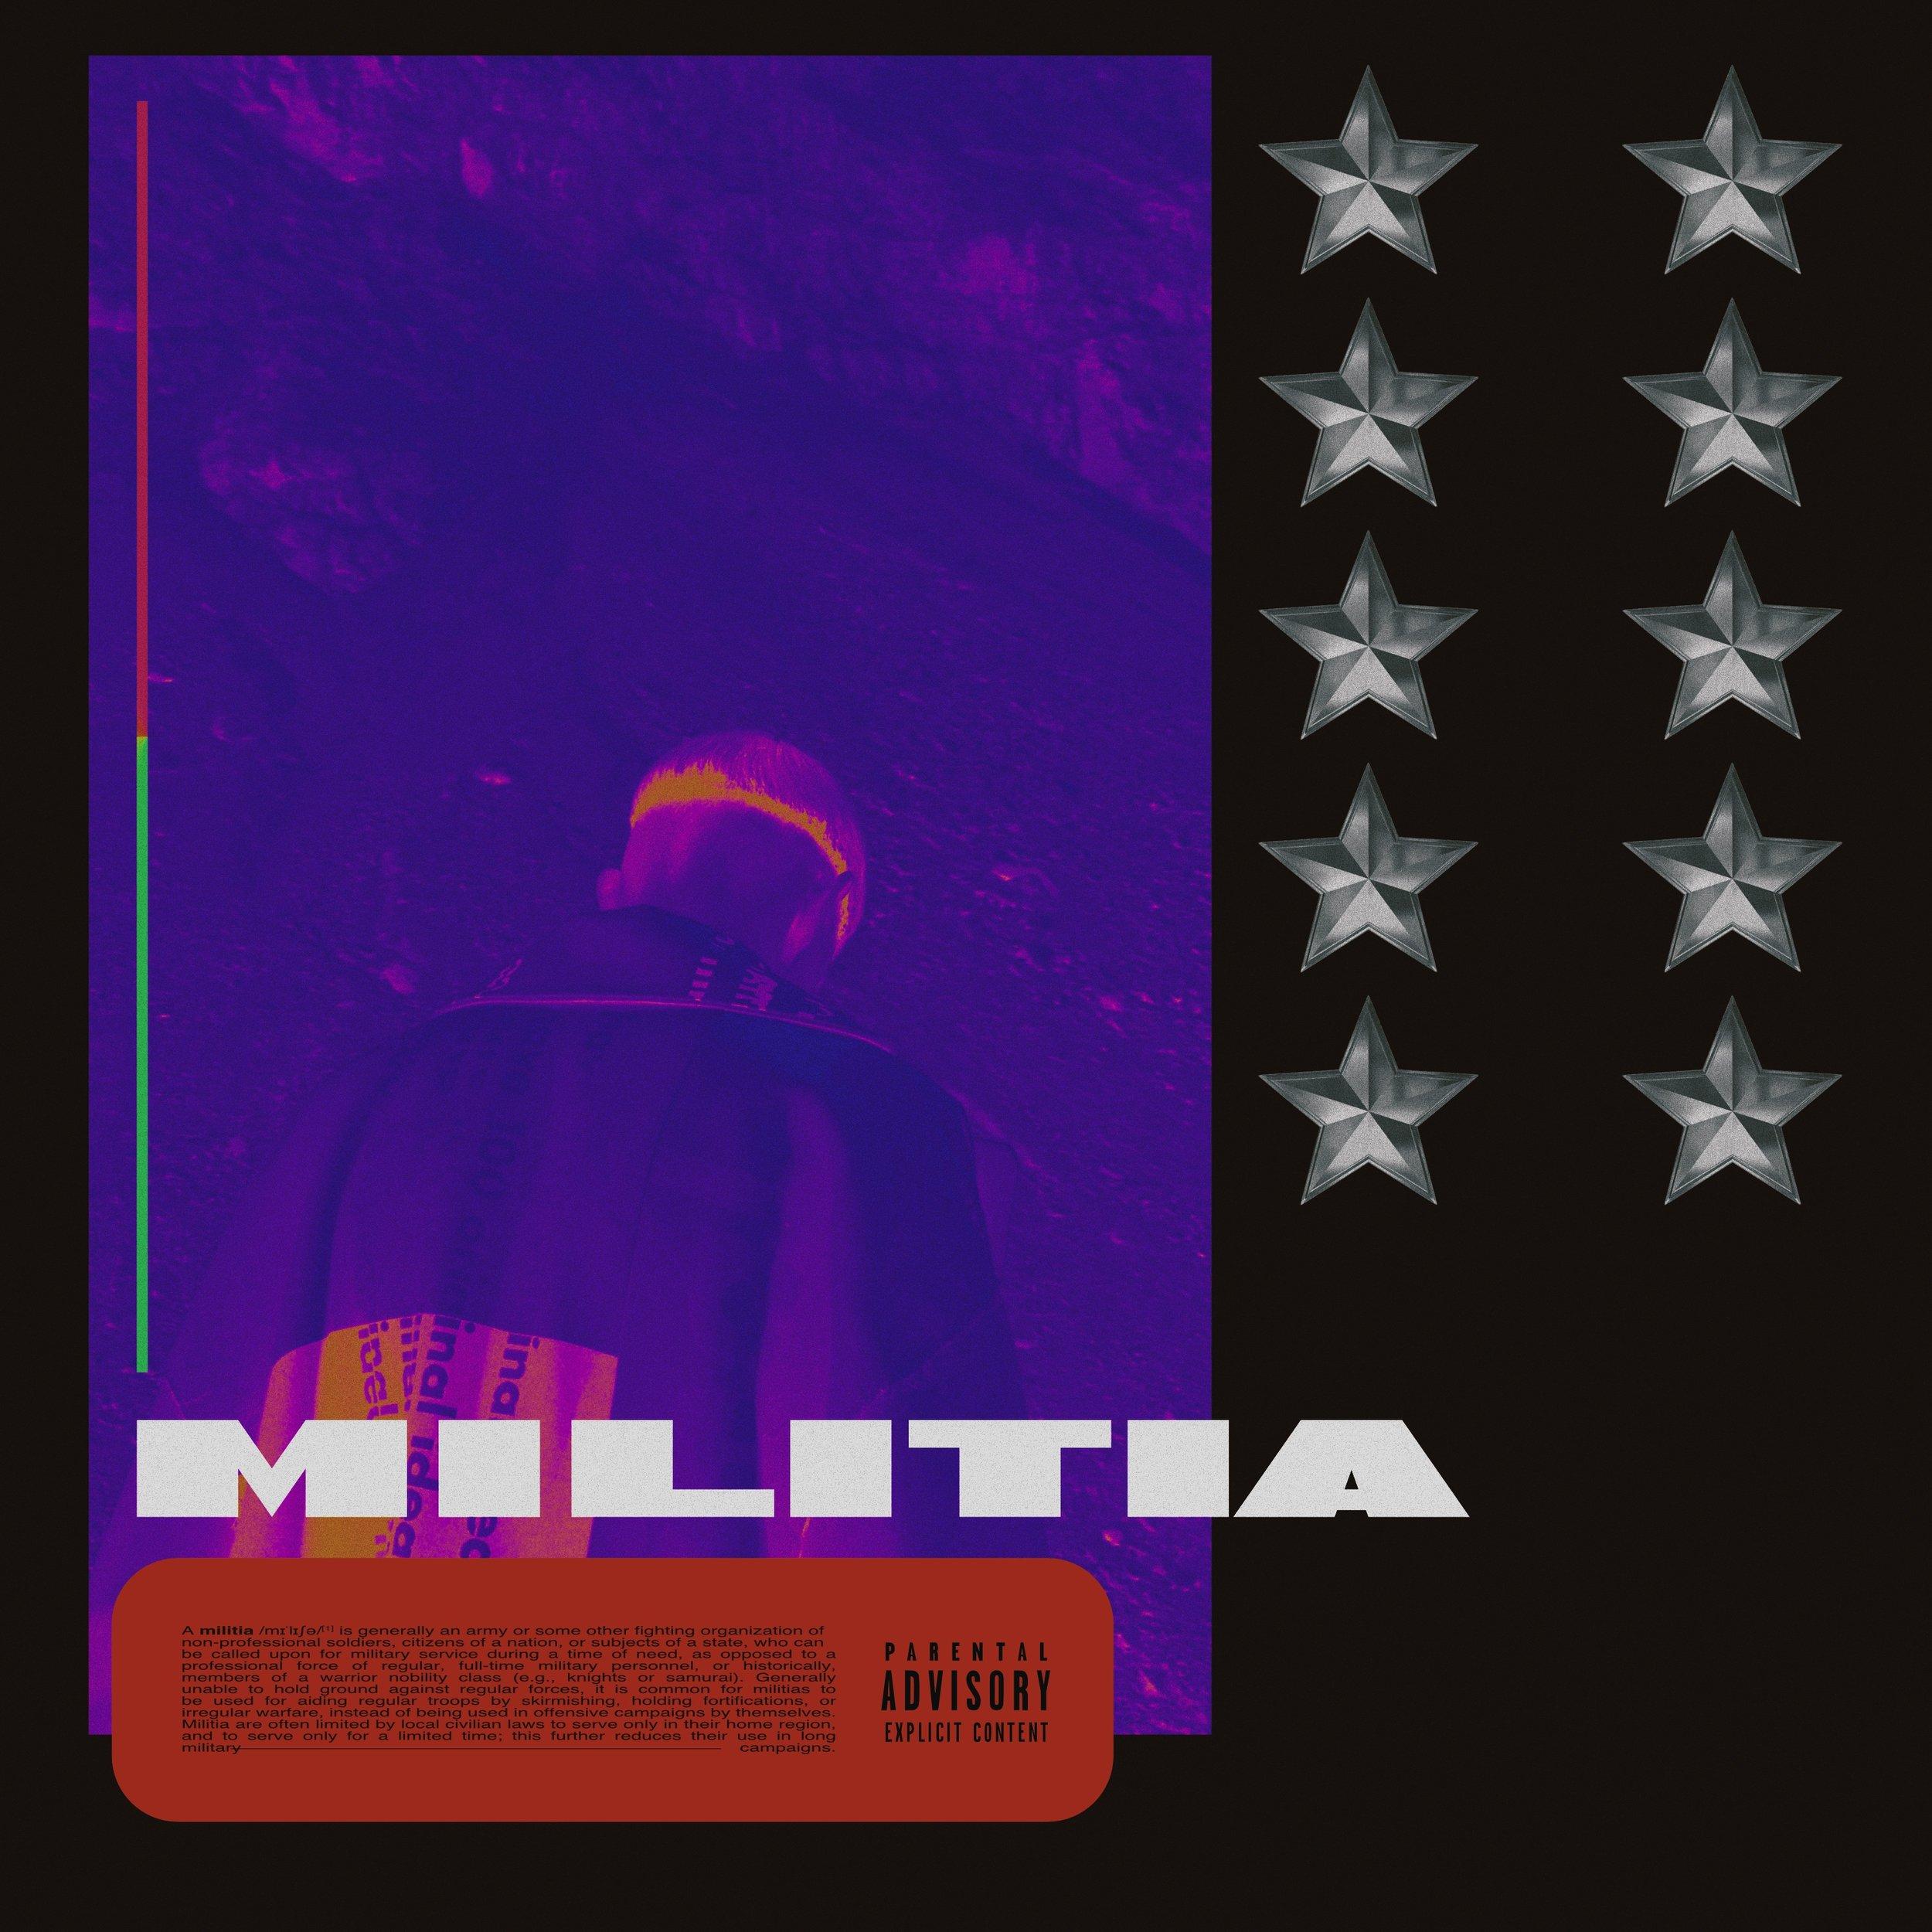 Militia_Proztaylor.jpg